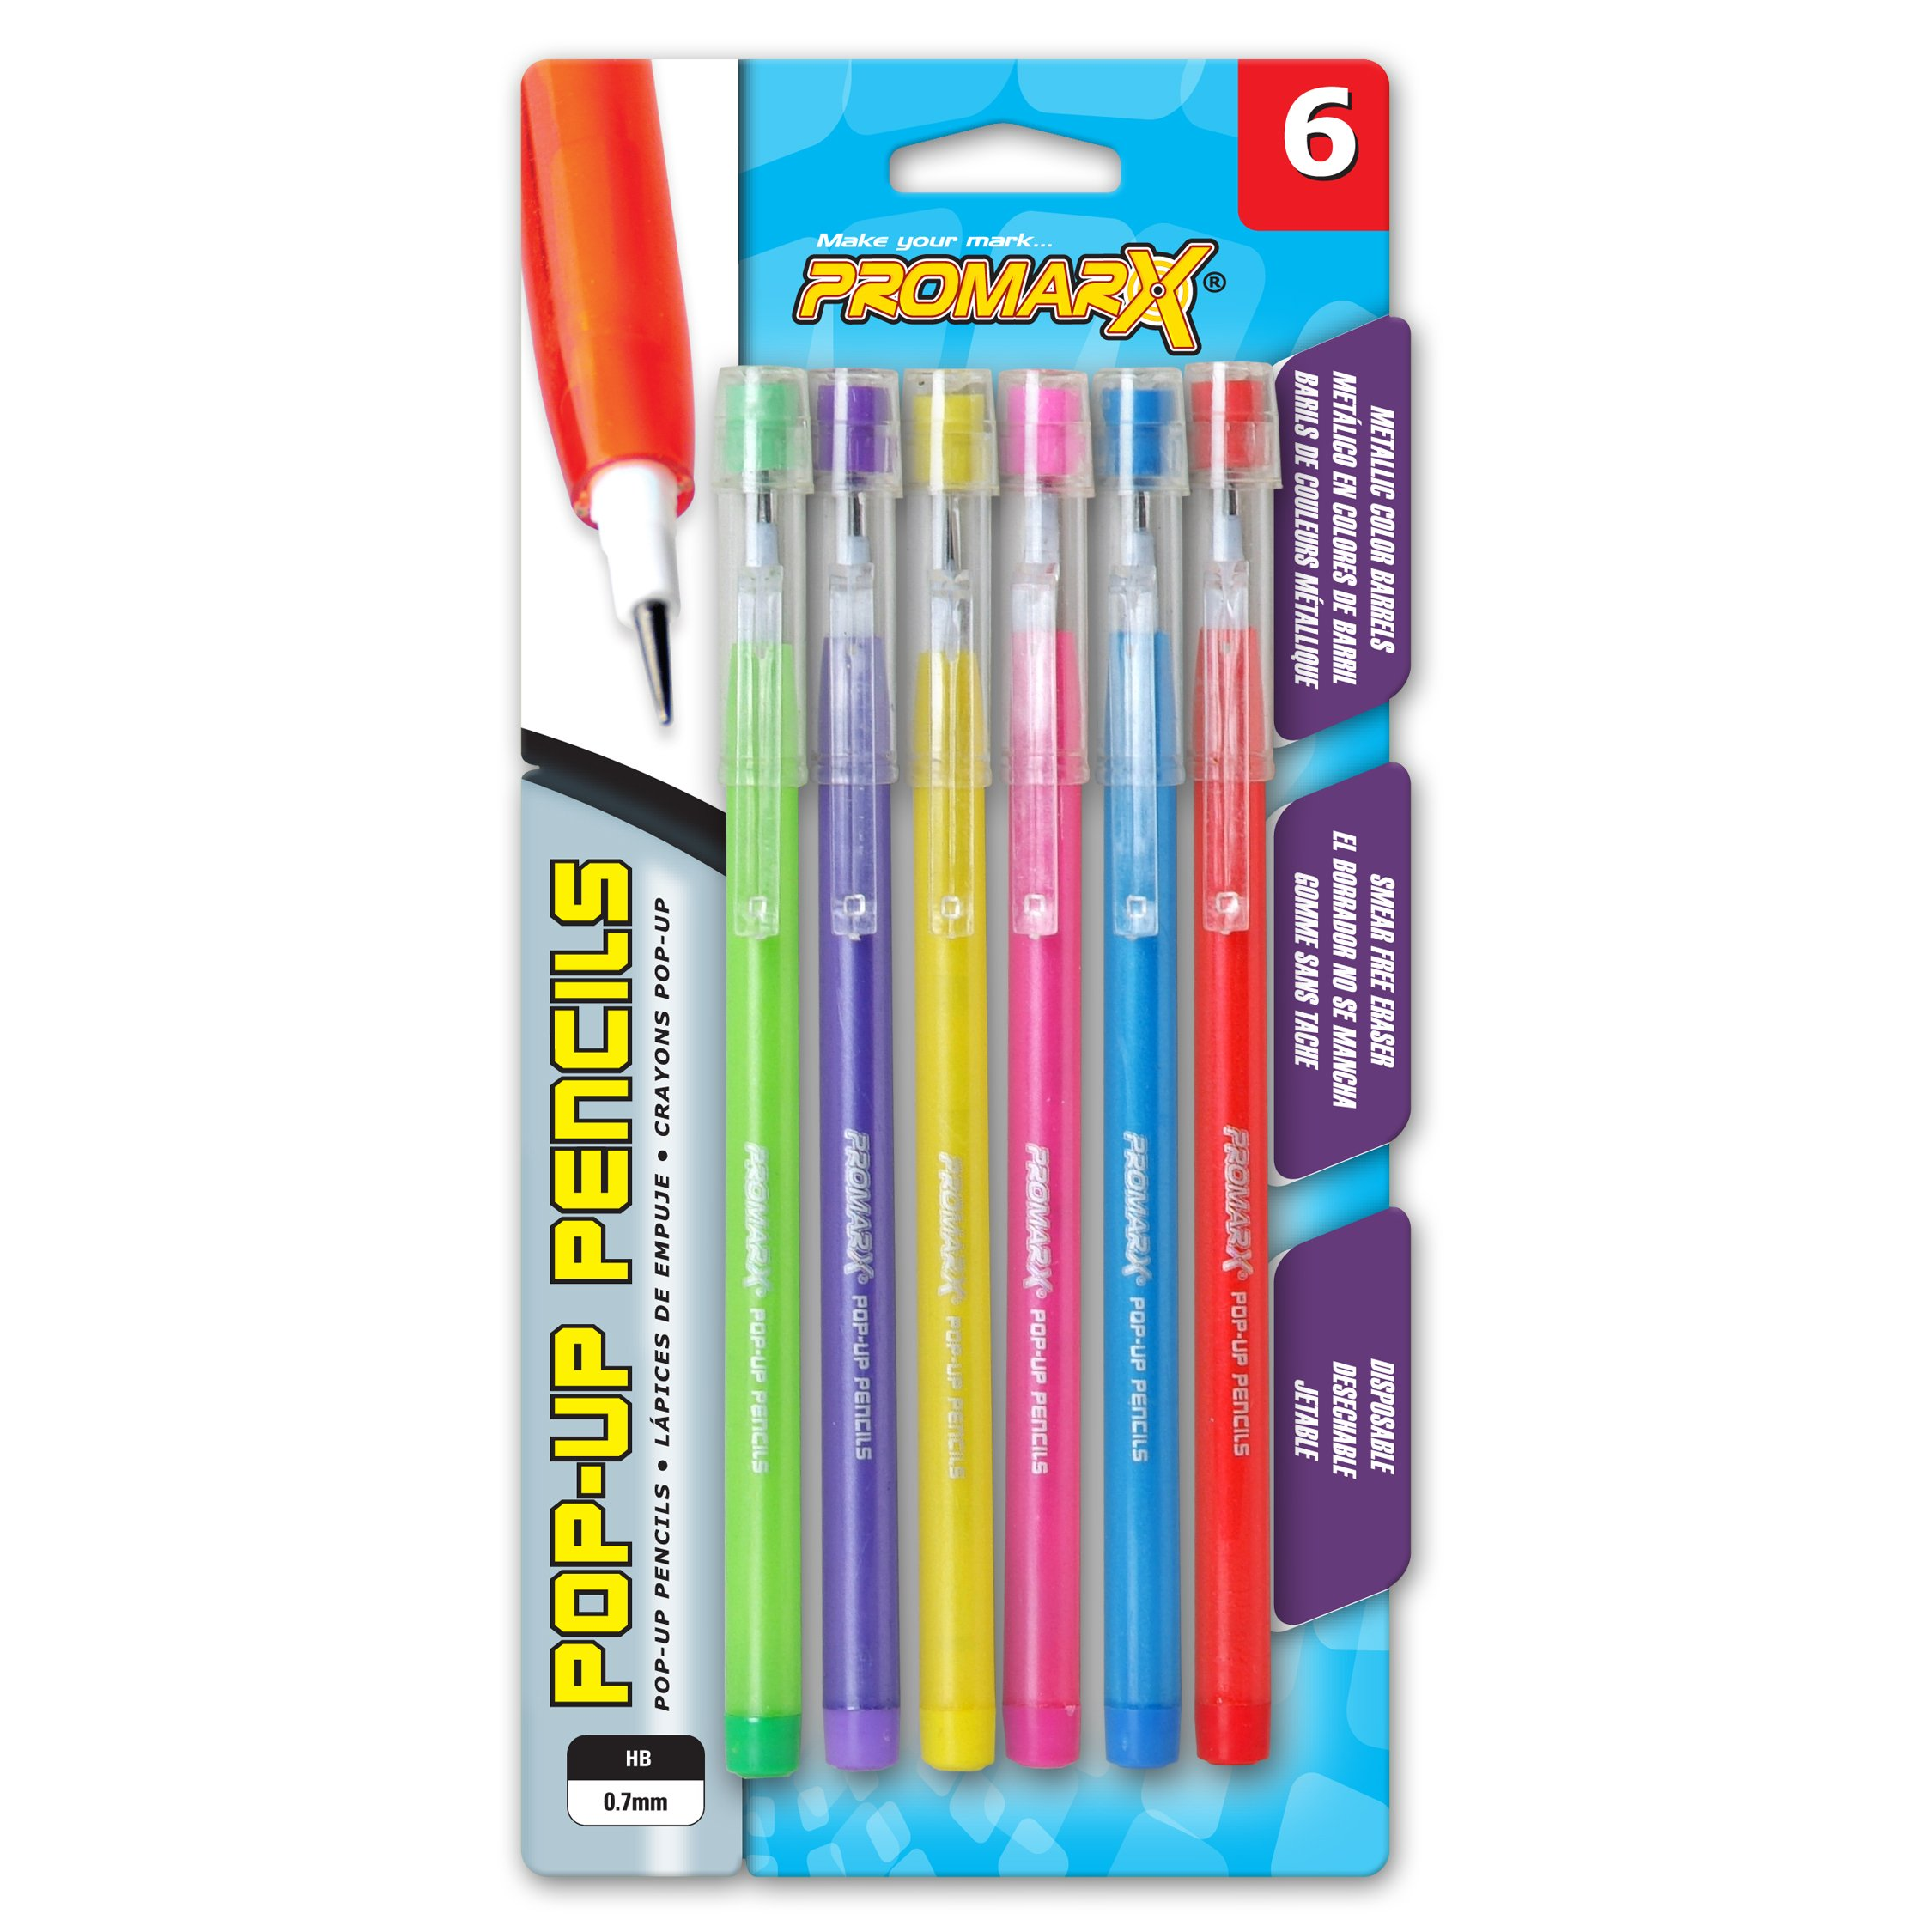 Promarx Metallic Fashion Pop-Up Pencils, 0.7 mm, Assorted Colored Barrels, 6 Count, Assorted Colors, Model:MQ26-DF7B06-48